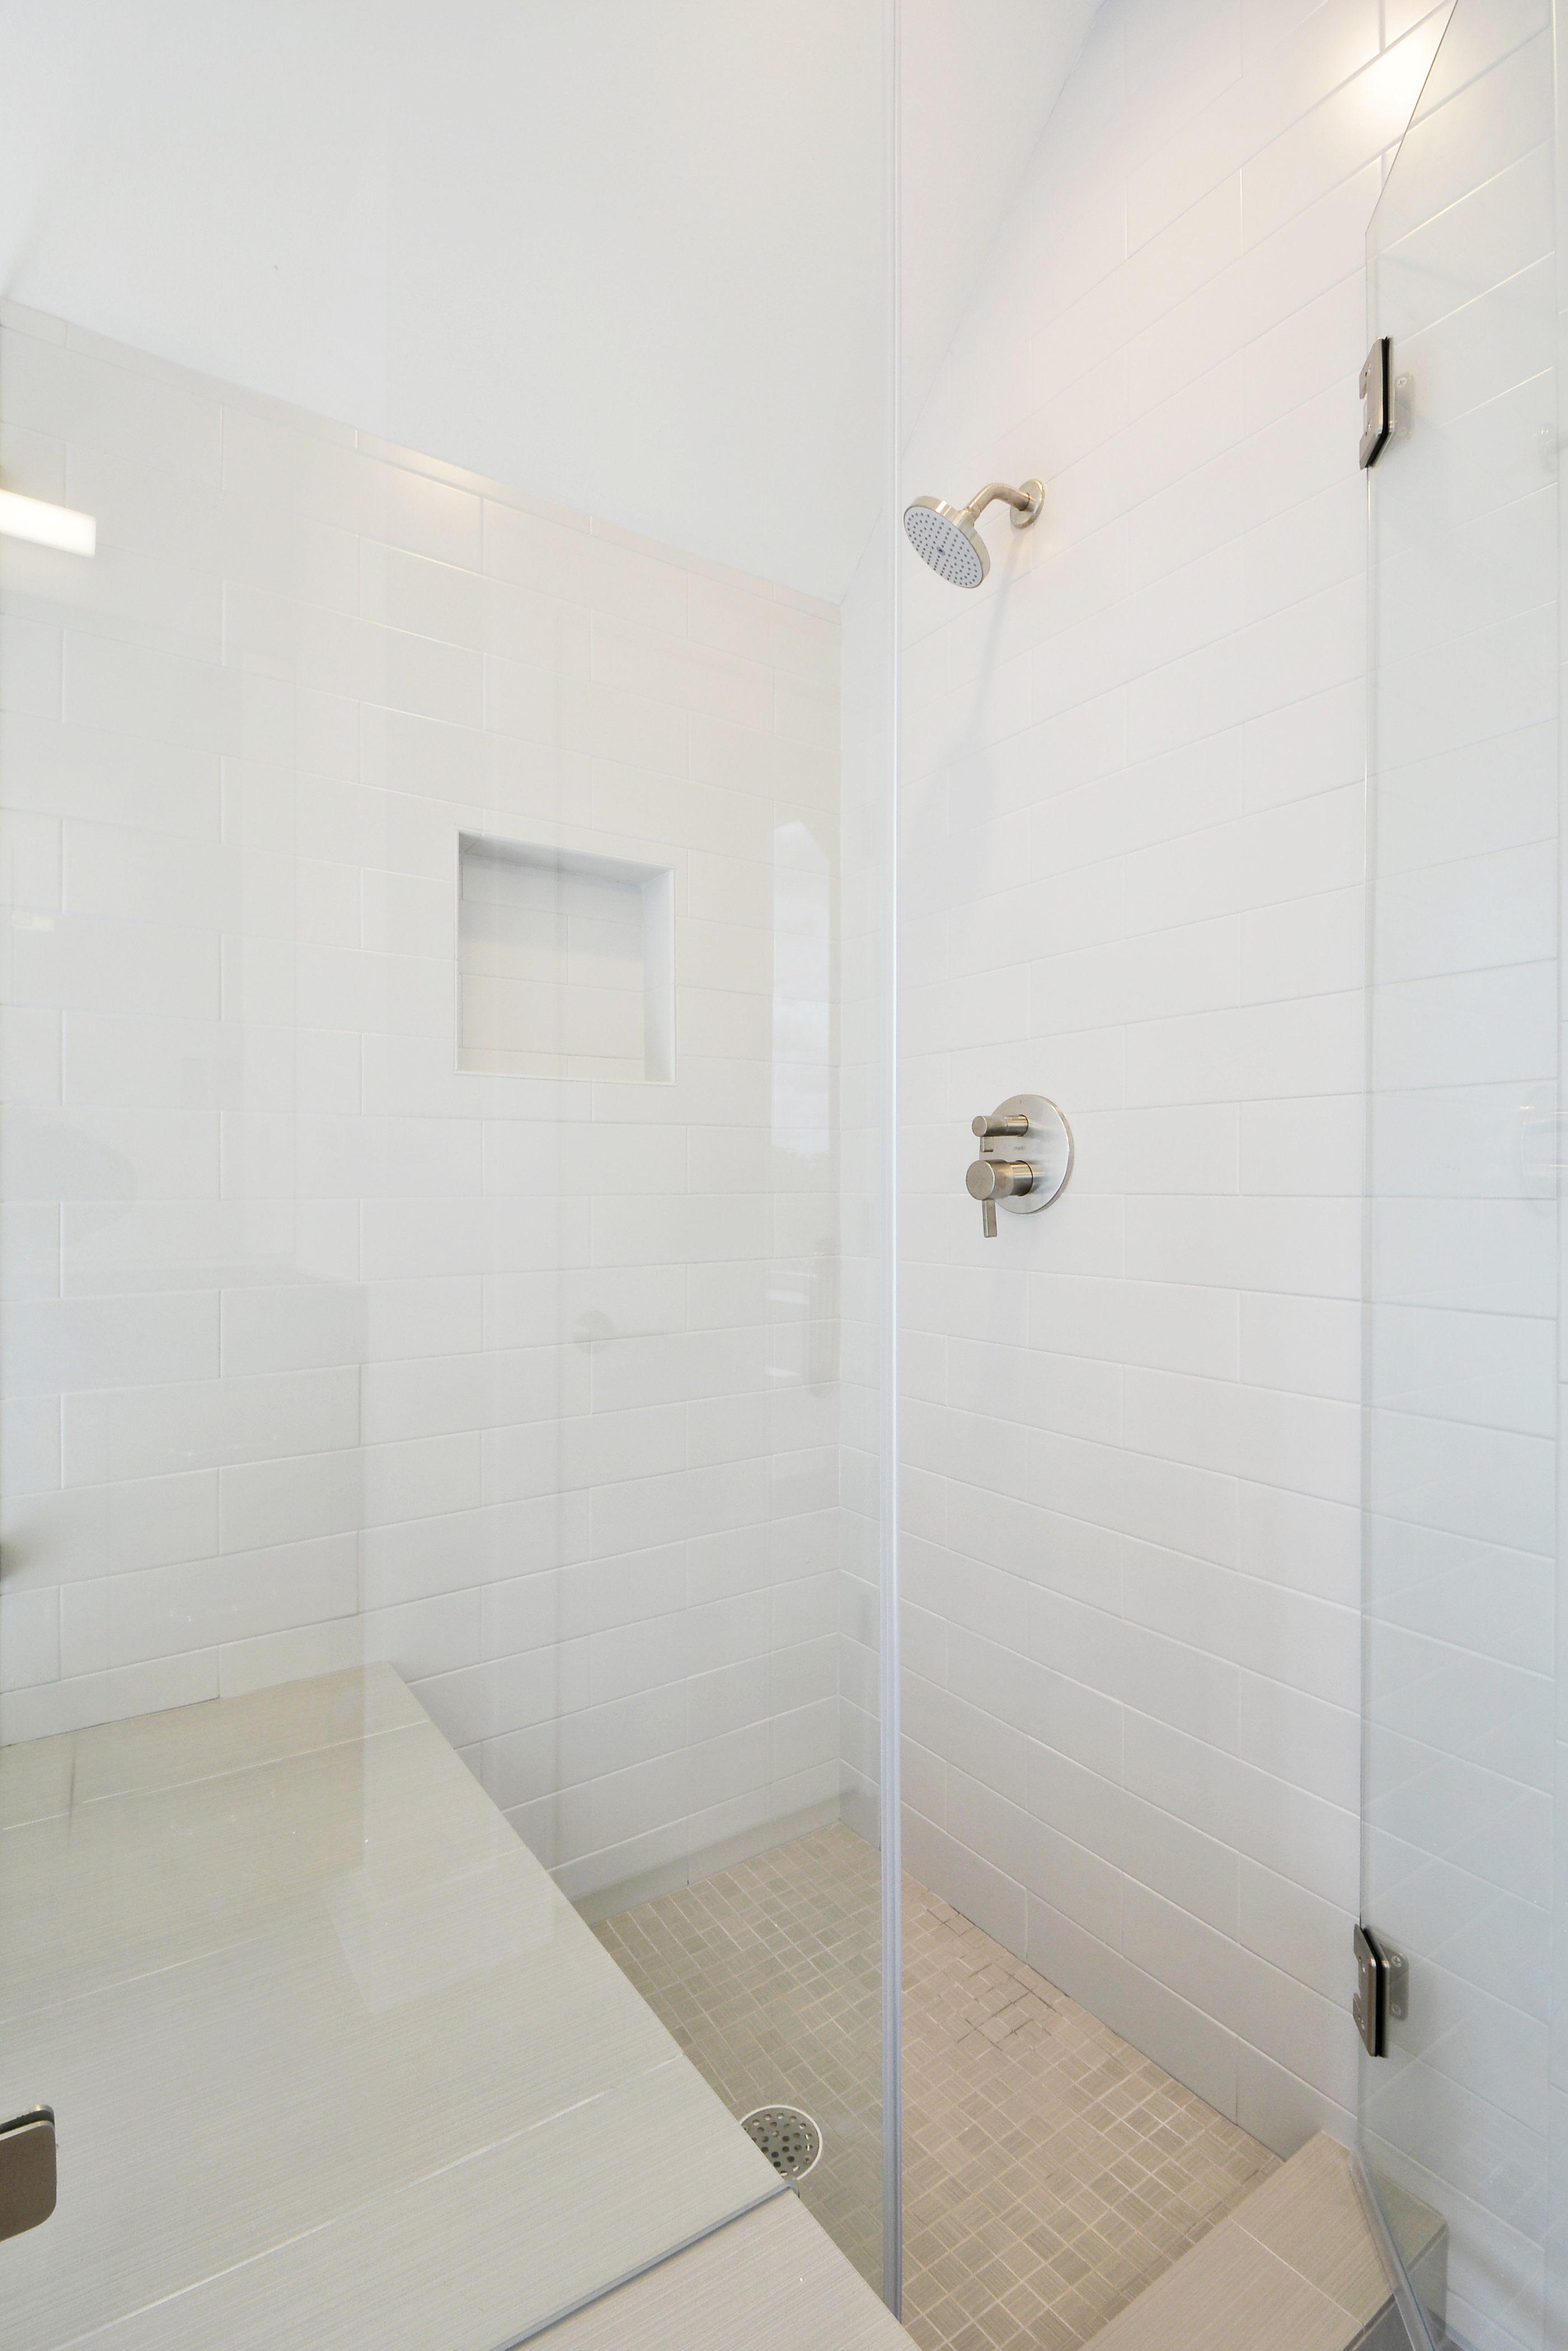 2010 Goodrich 1A | Master bath | Shower  | White subway tile | Austin Homebuilder | Modern home | Austin home | Modern farmhouse